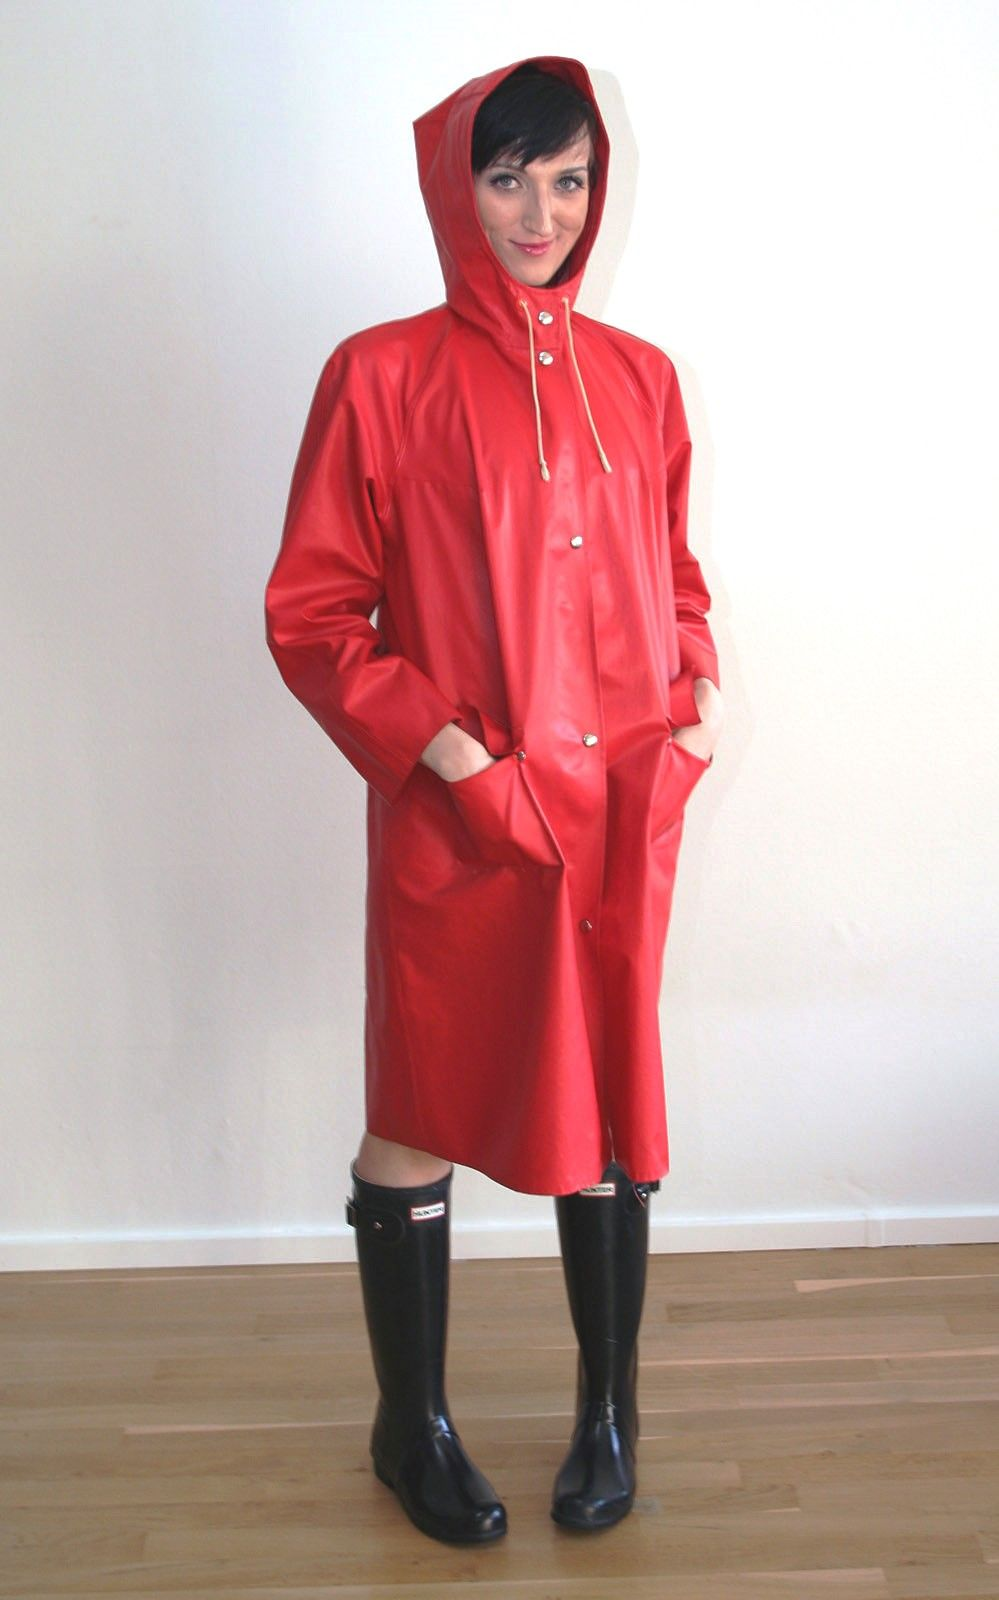 Red Rubber Mac Screwfix Pinterest Macs Raincoat And 4 Way Switch